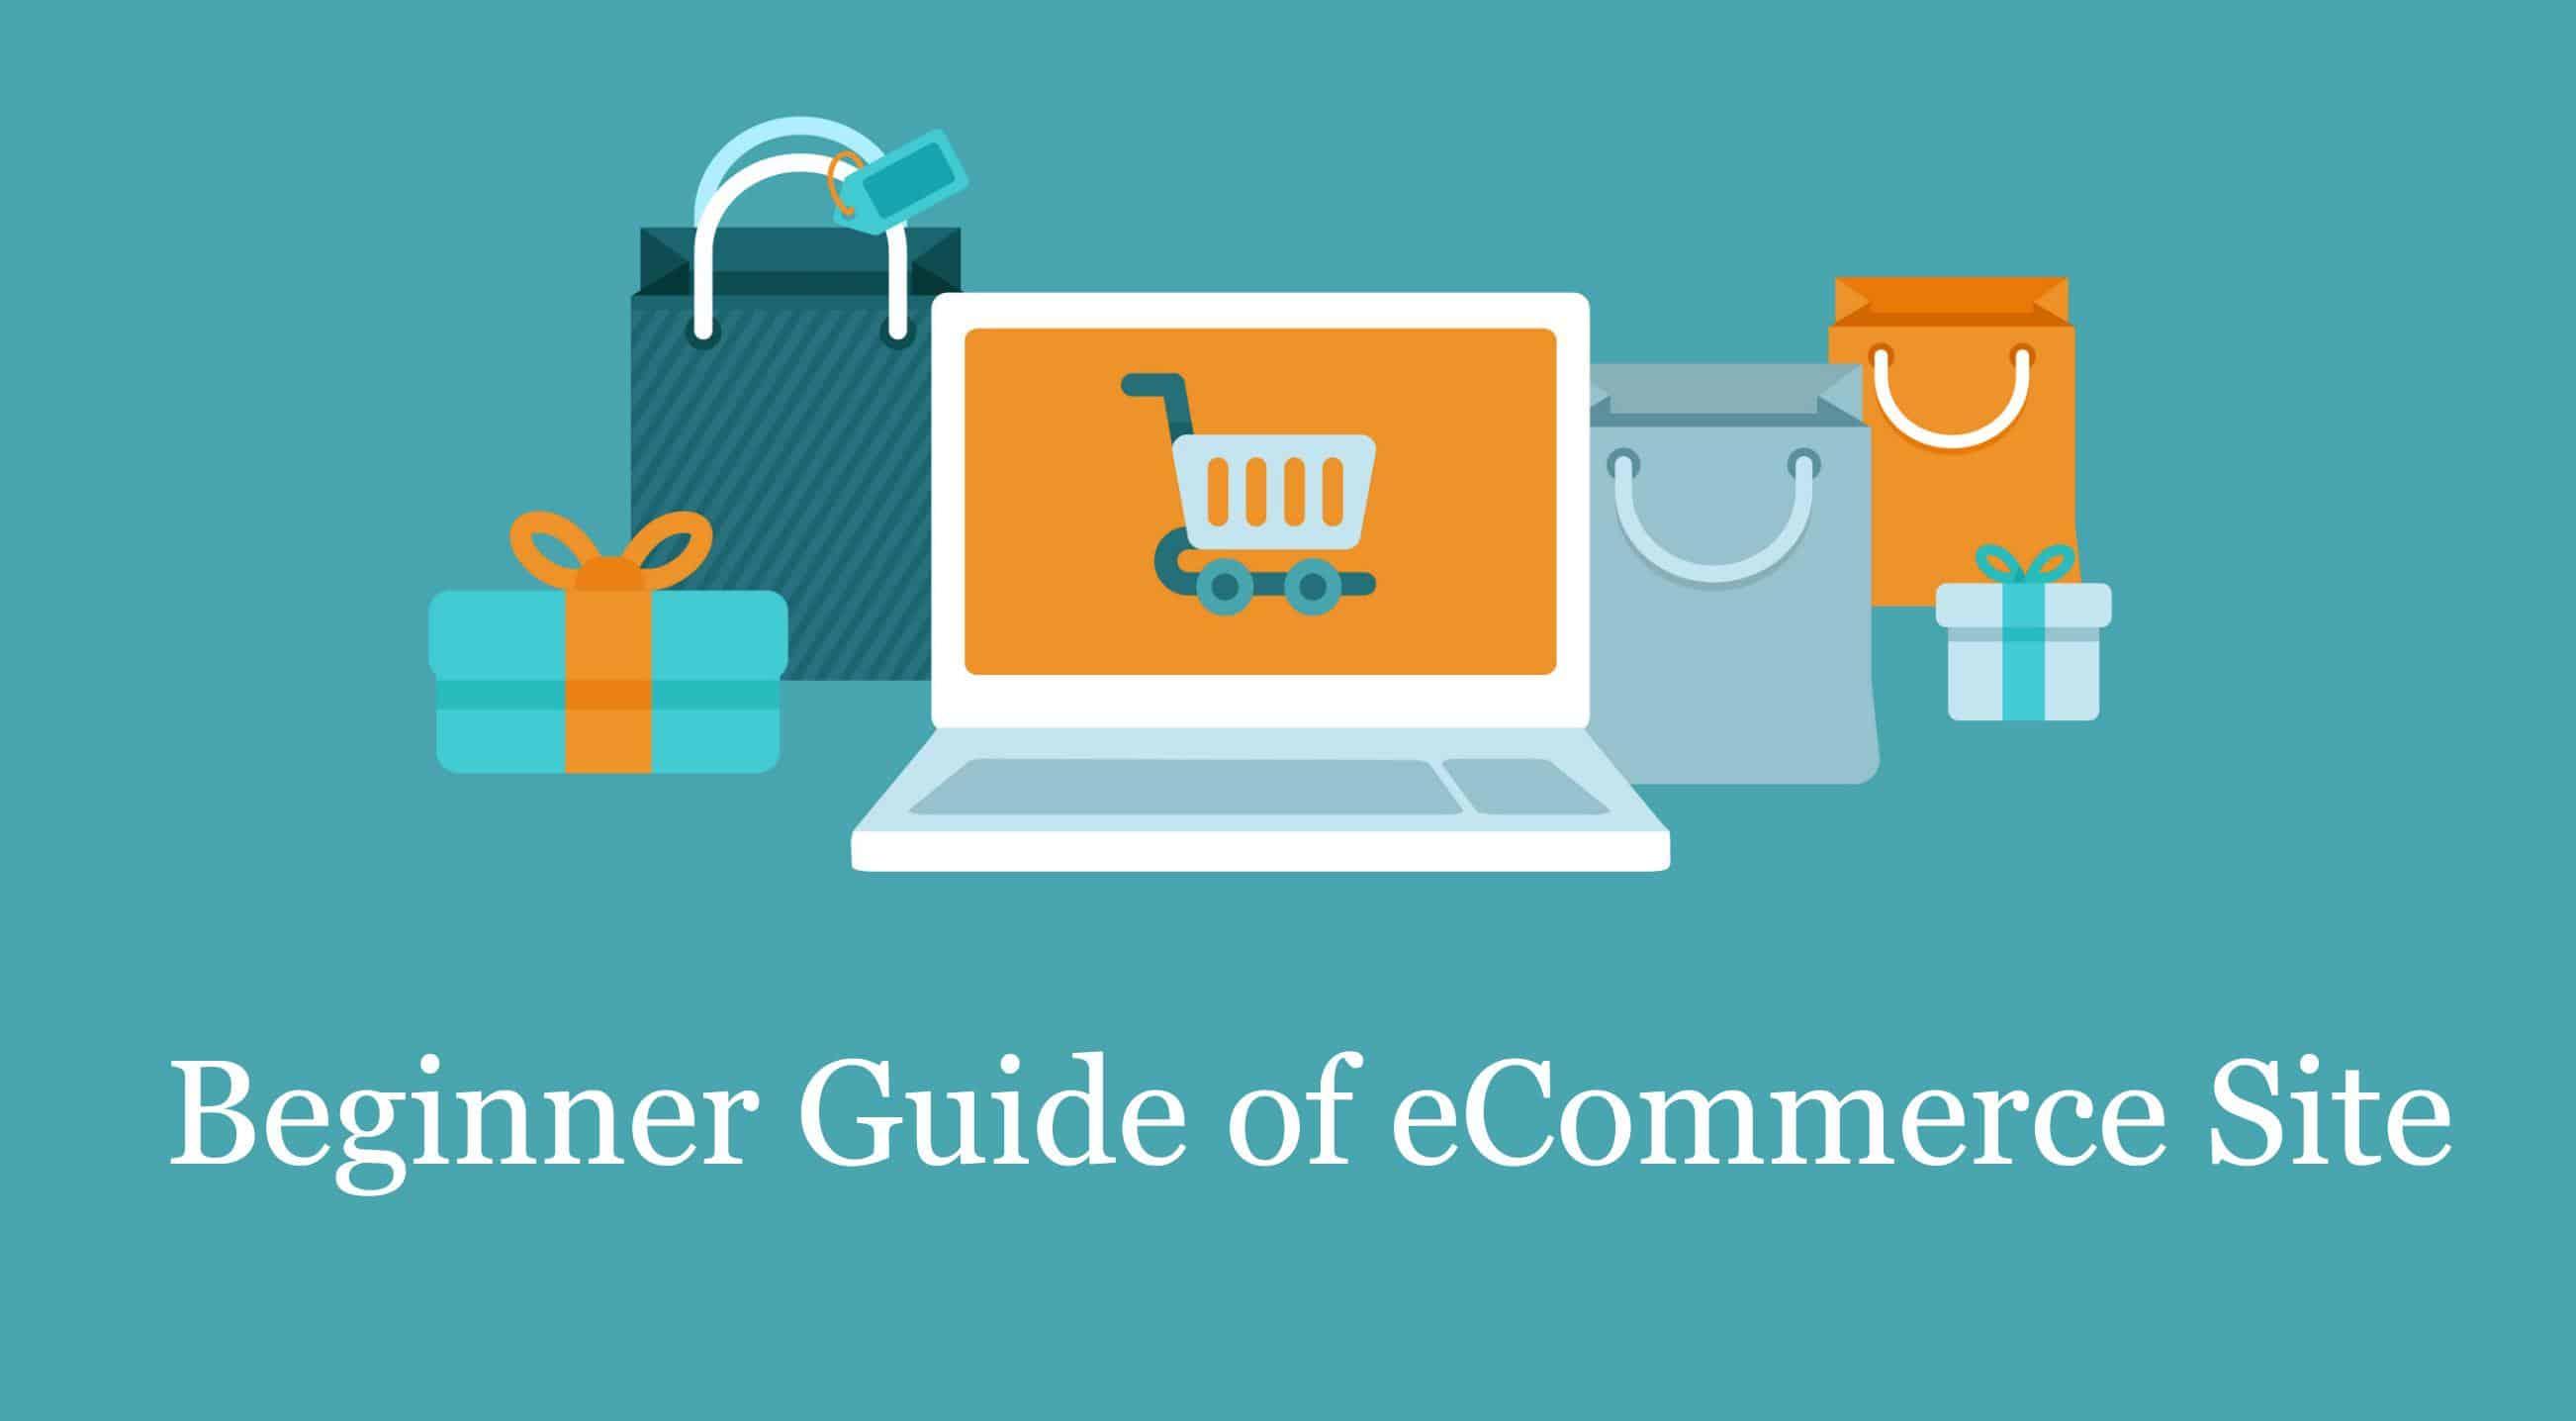 The Beginner Guide to setup a Multivendor eCommerce Website